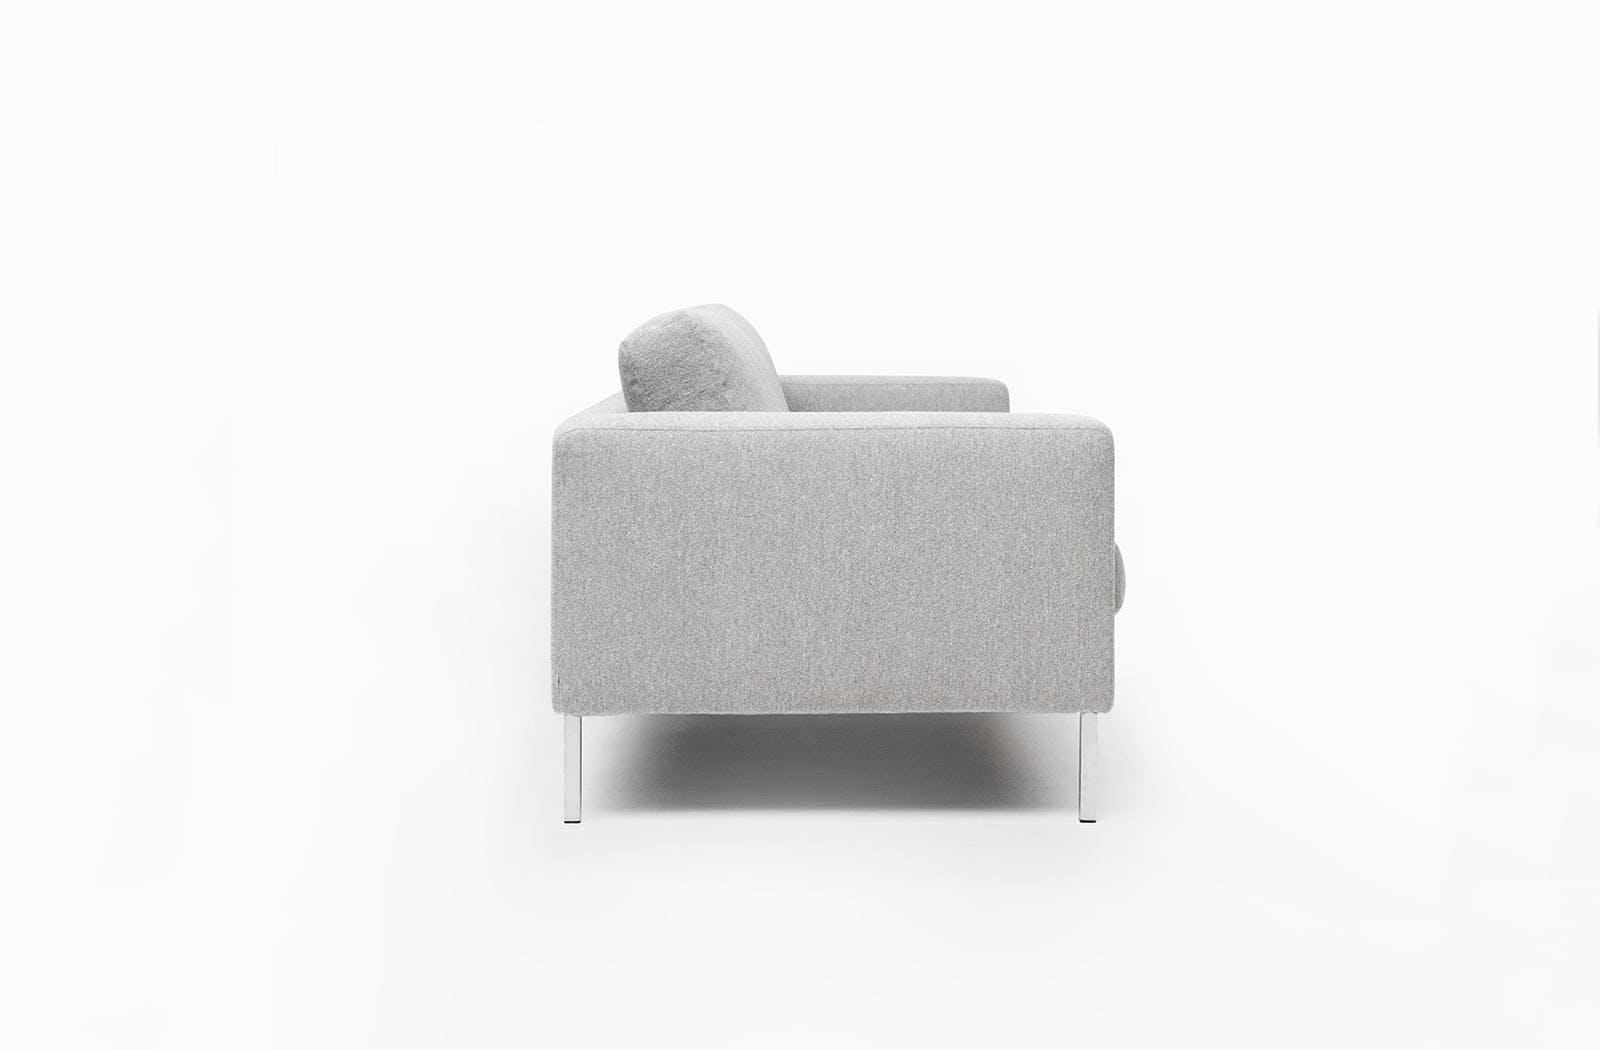 Bensen Neo Sofa Side